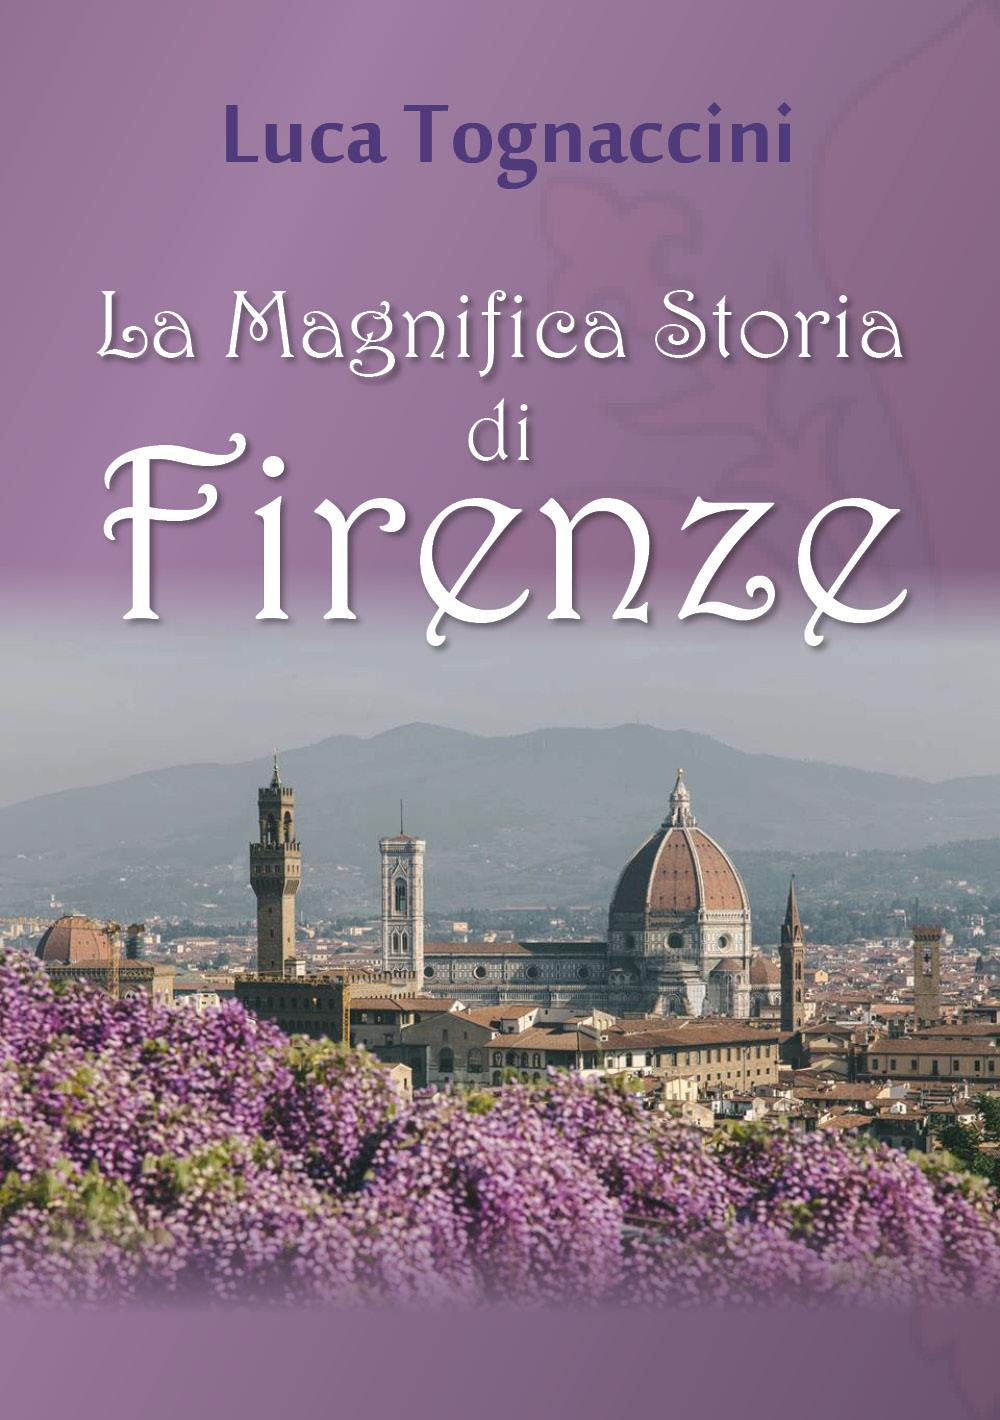 La Magnifica Storia di Firenze